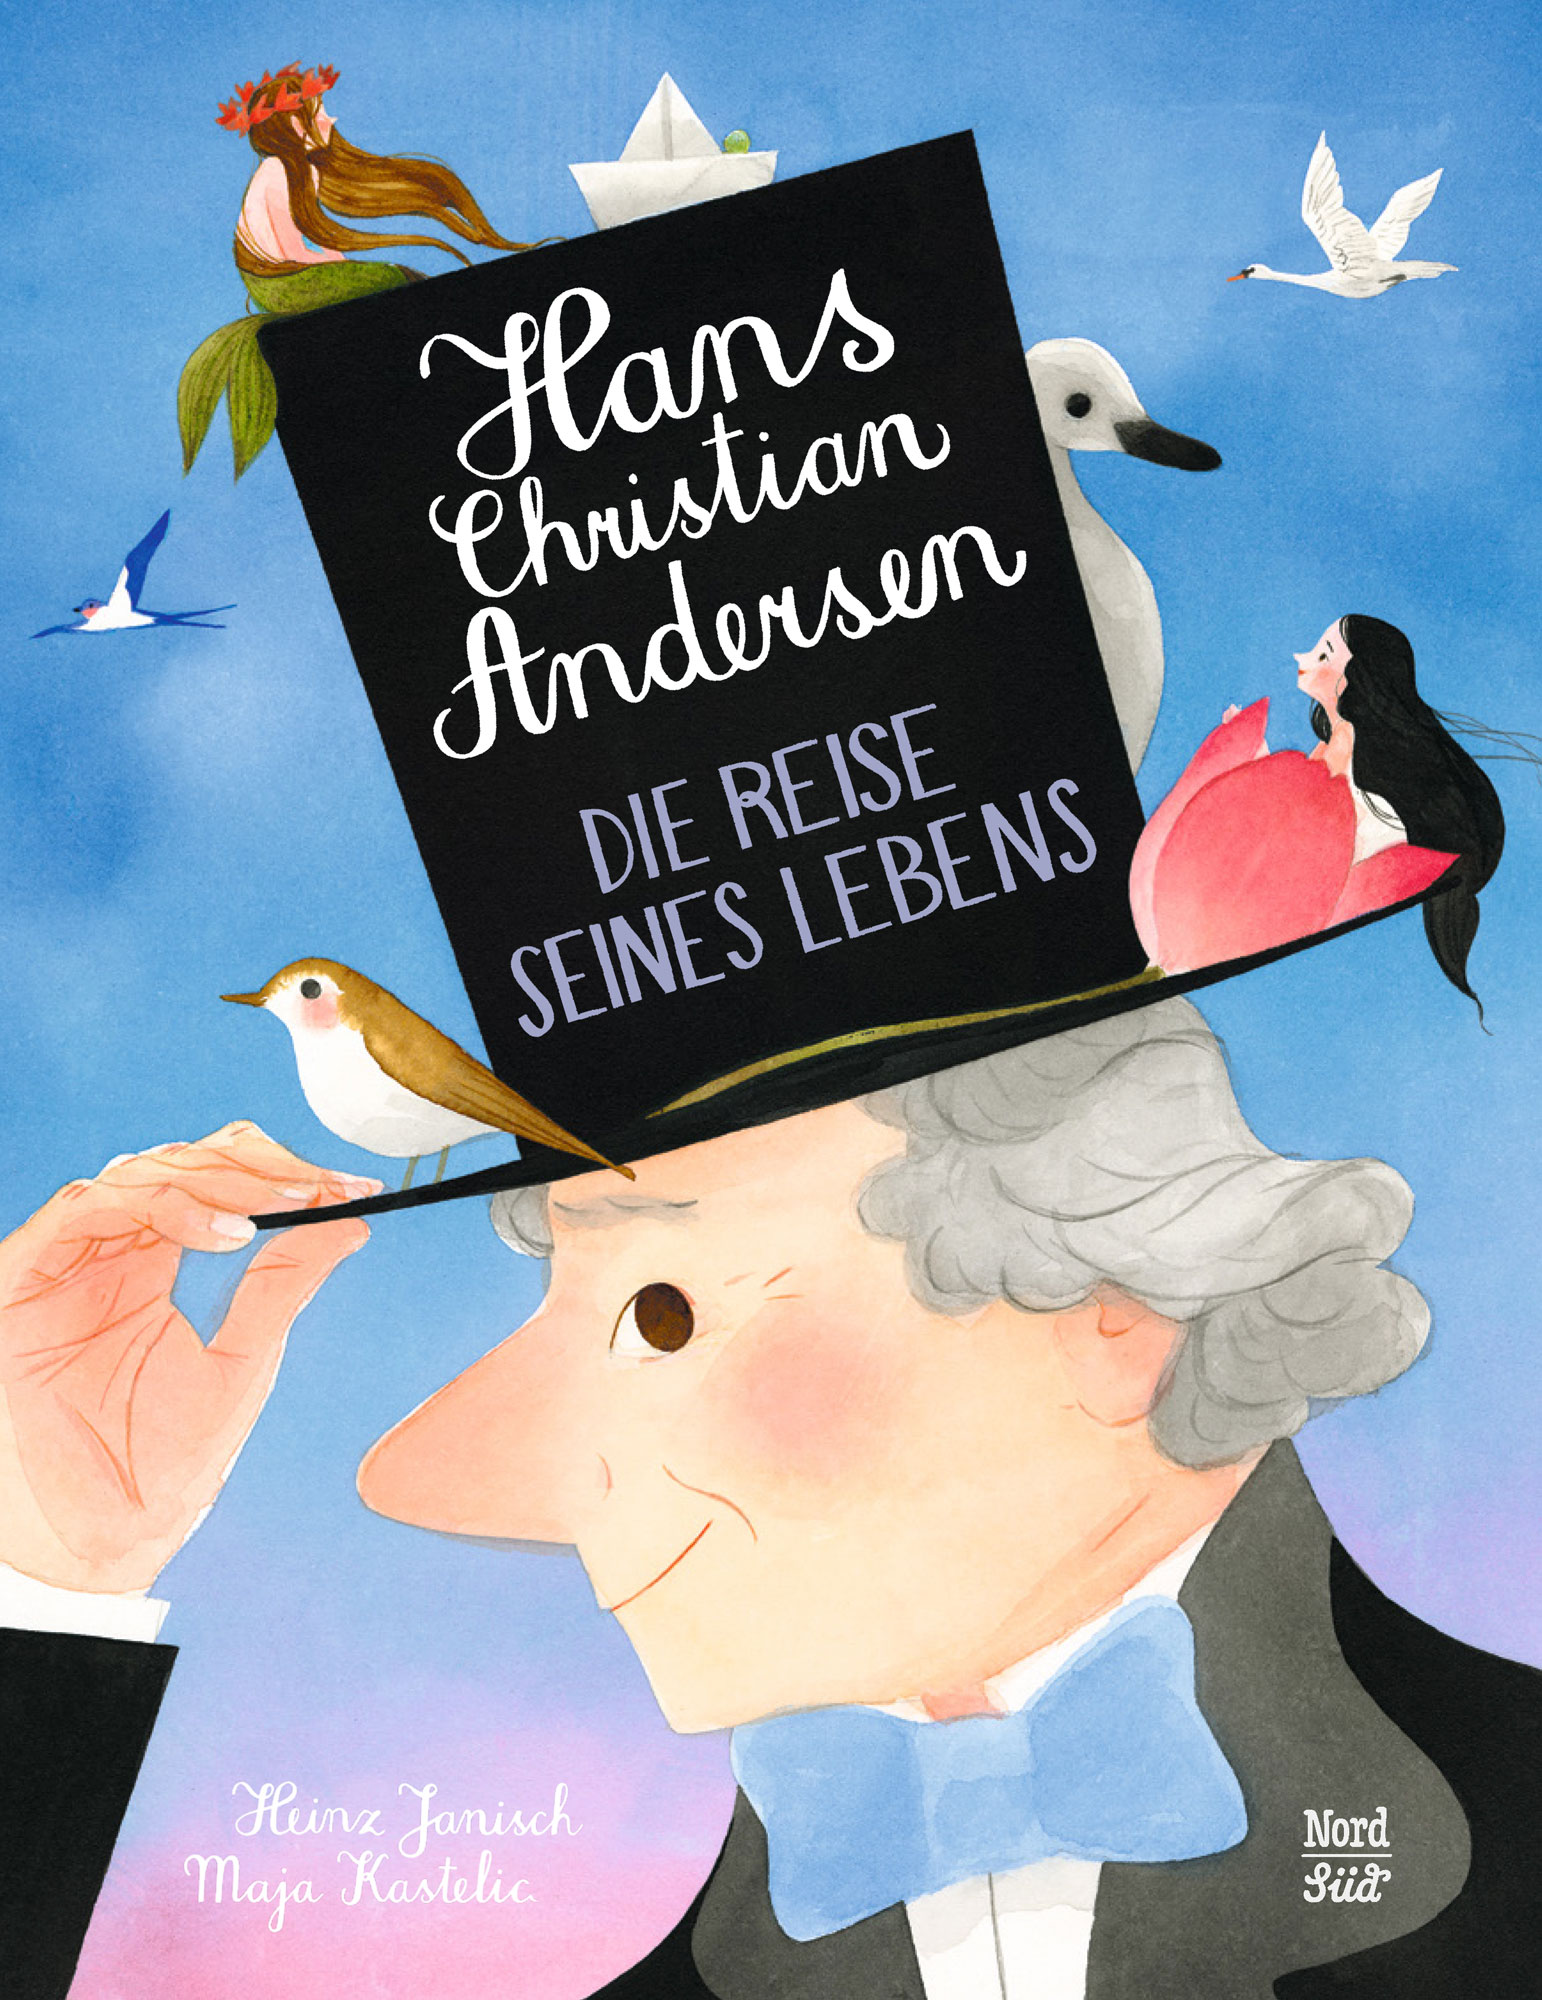 »Hans Christian Andersen - Die Reise seines Lebens« - Nord Süd